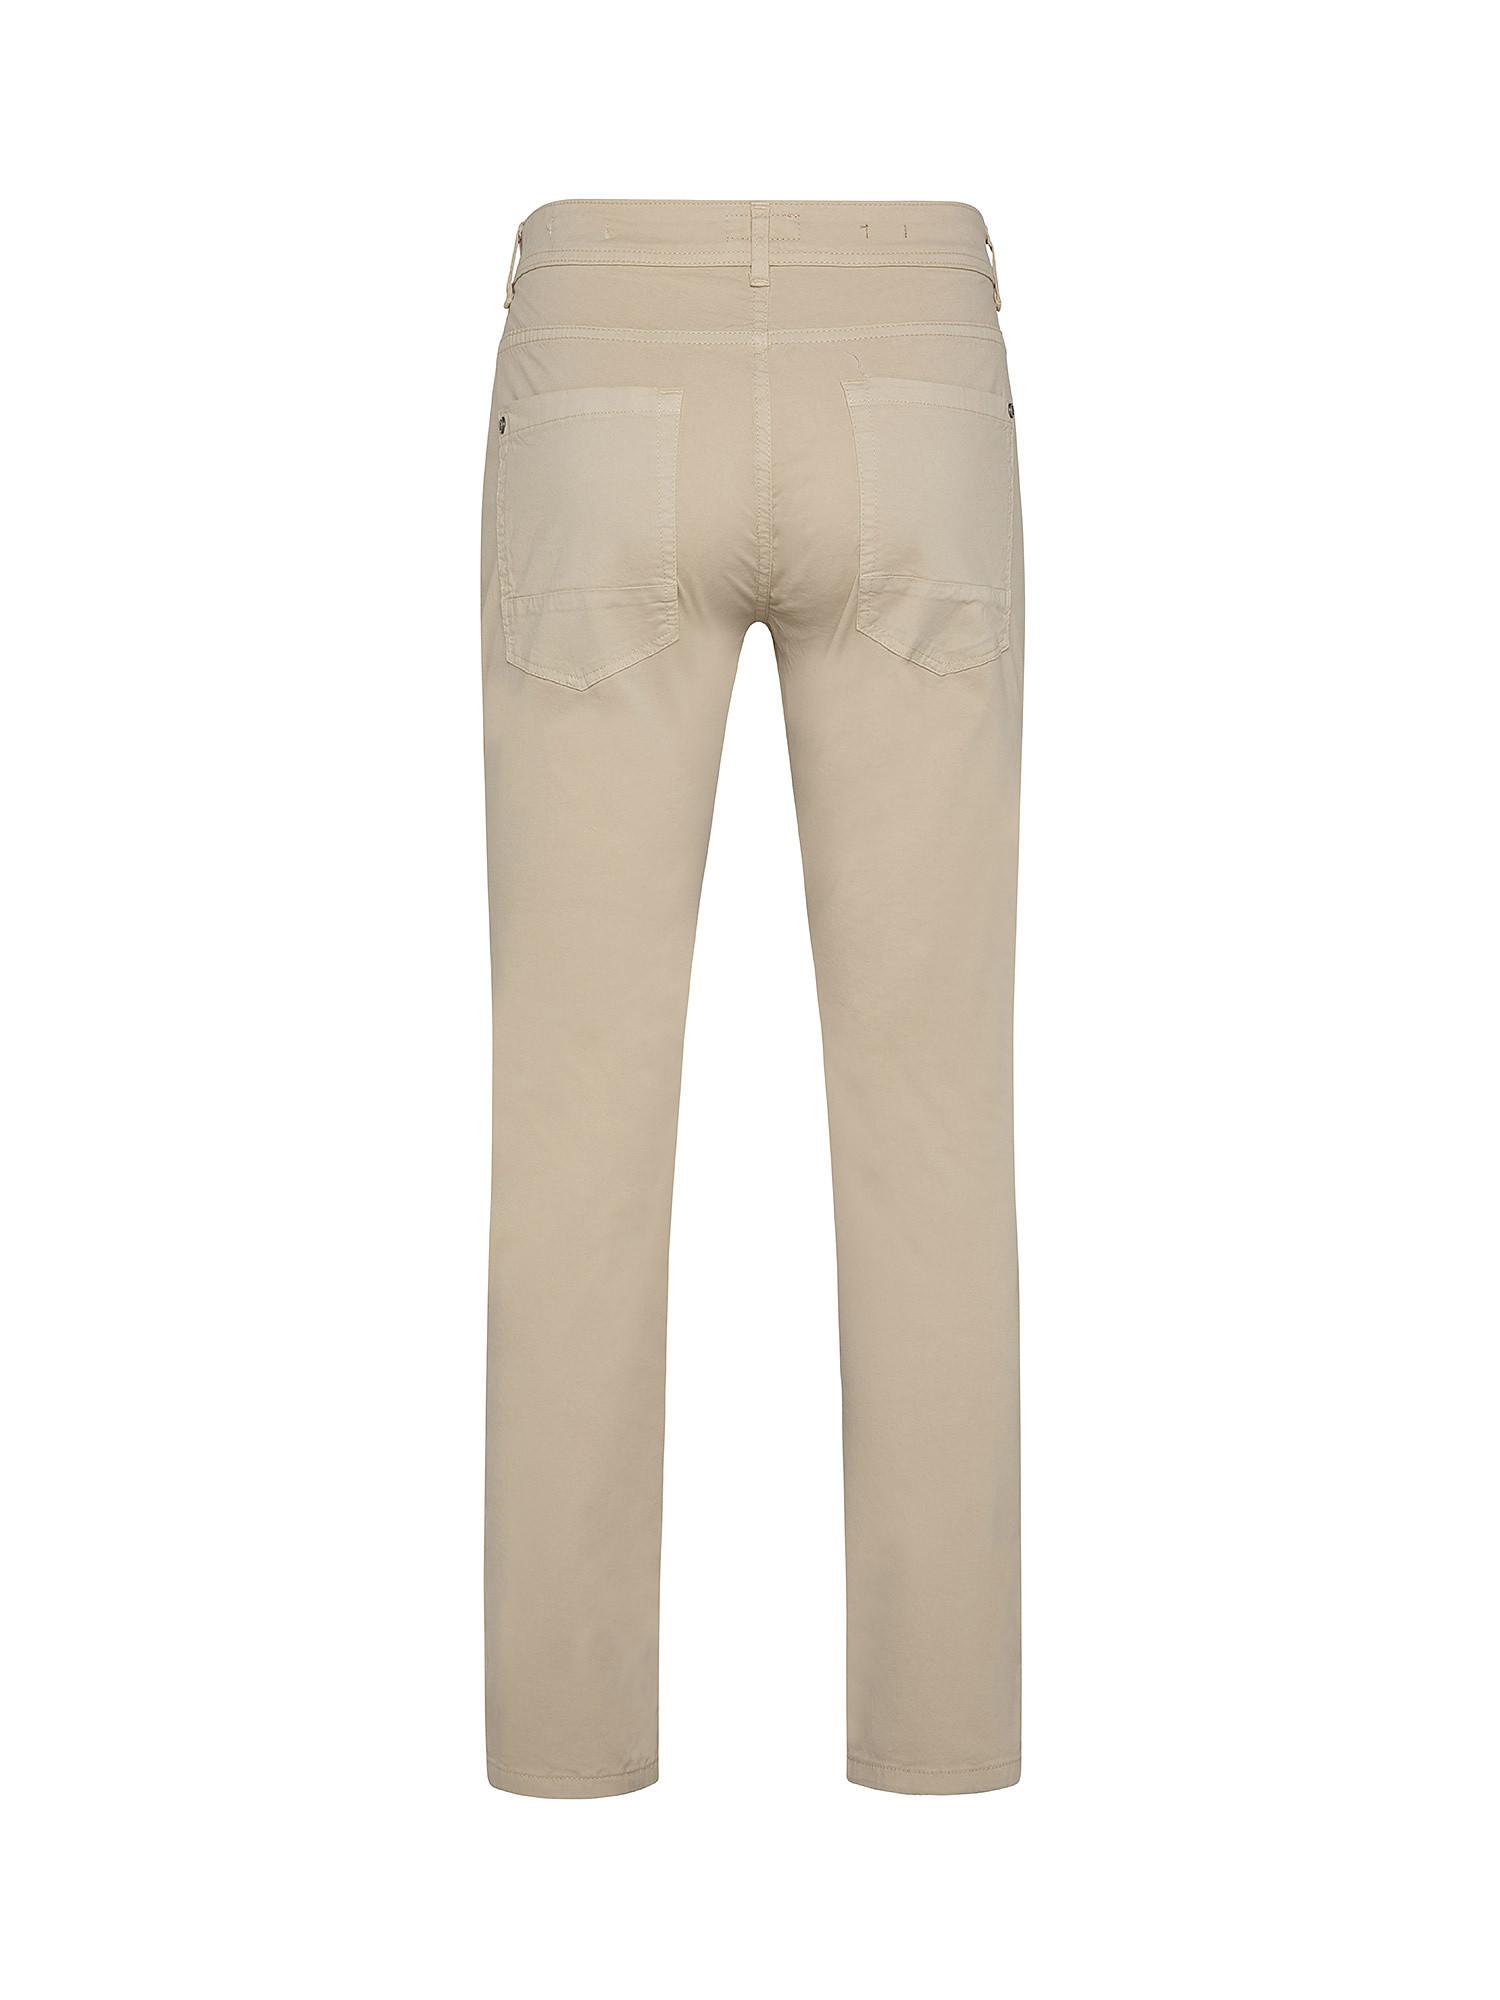 Pantalone da uomo in cotone elasticizzato slim fit, Beige, large image number 1